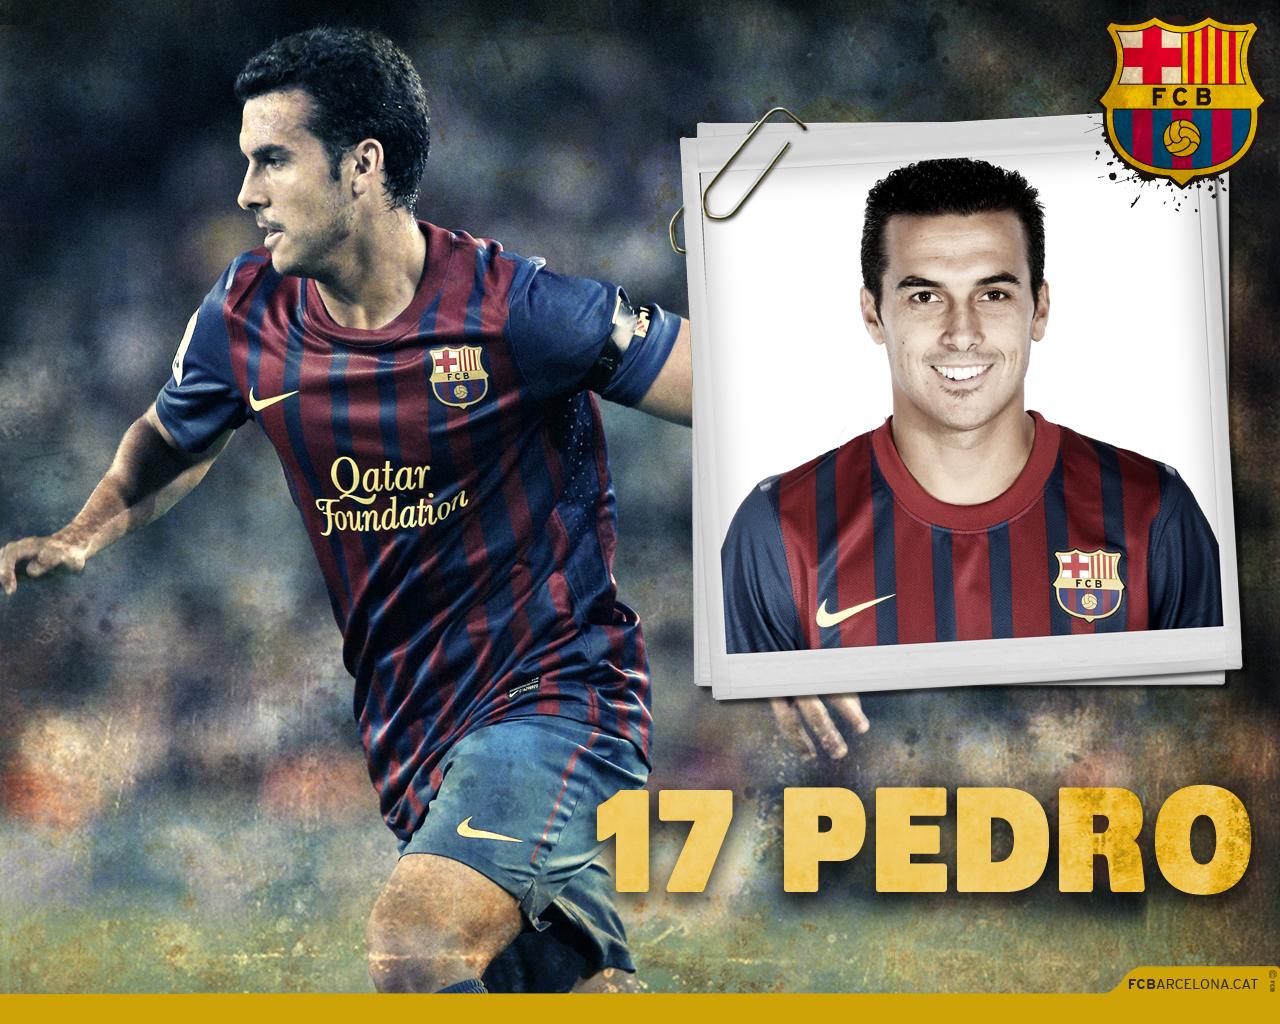 World Sports Hd Wallpapers: Pedro FC Barcelona Hd Wallpapers